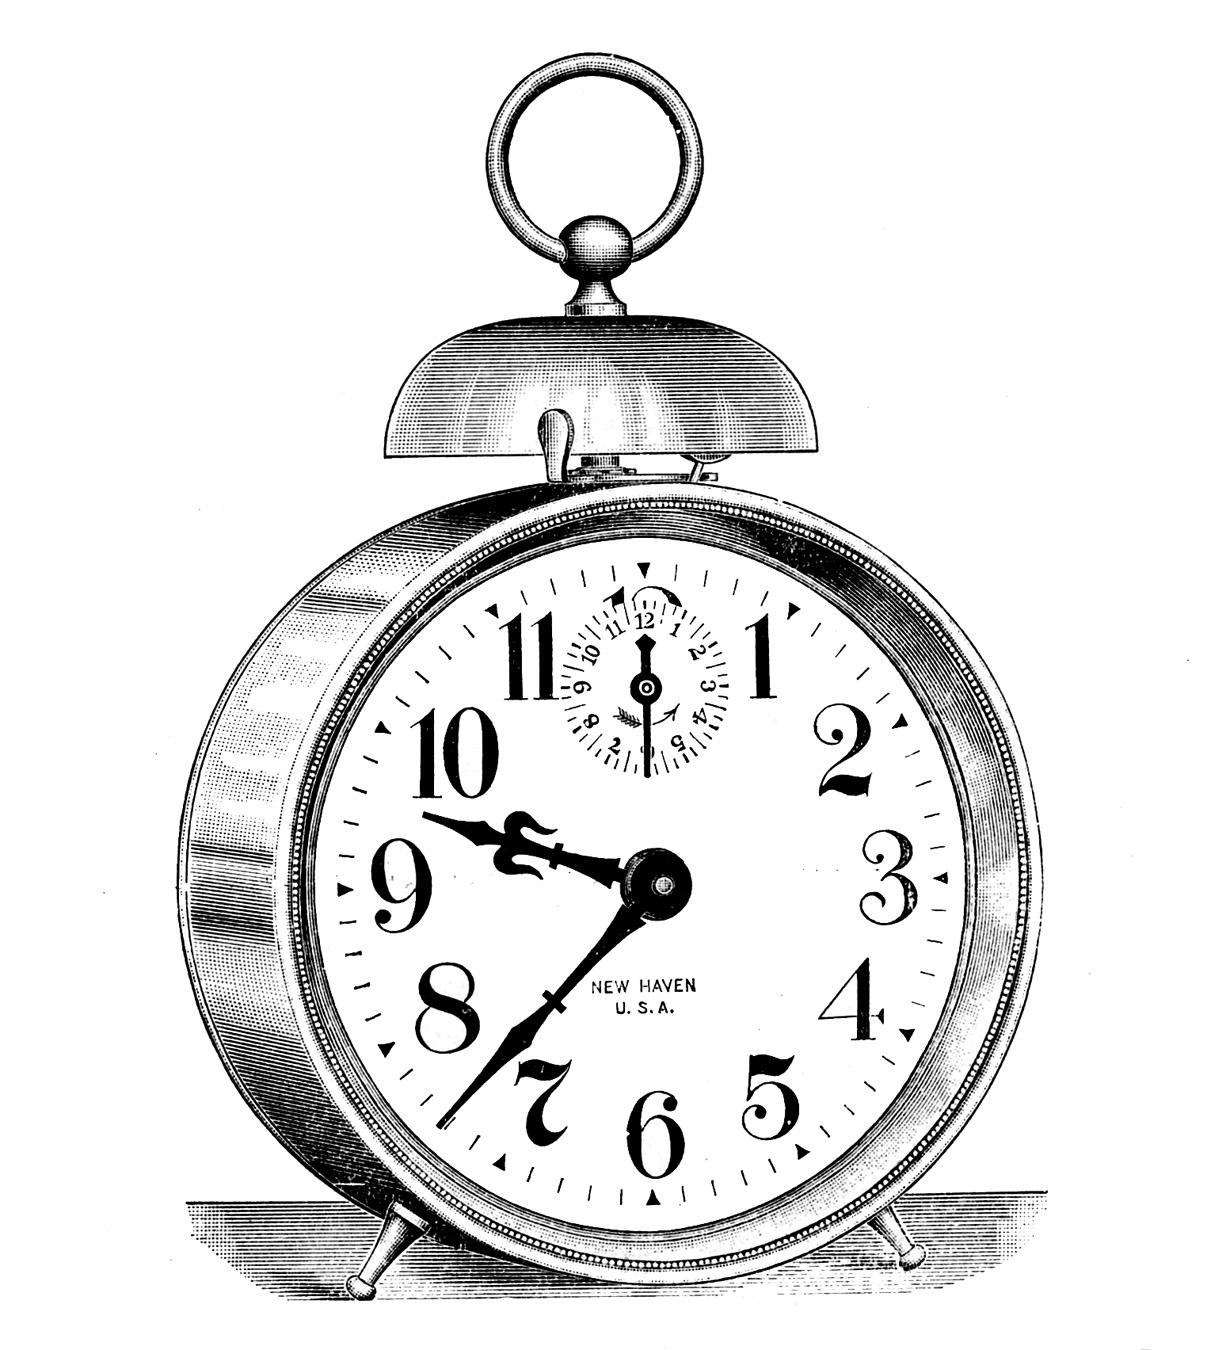 Vintage Clip Art - Classic Alarm Clock - Steampunk - The ...